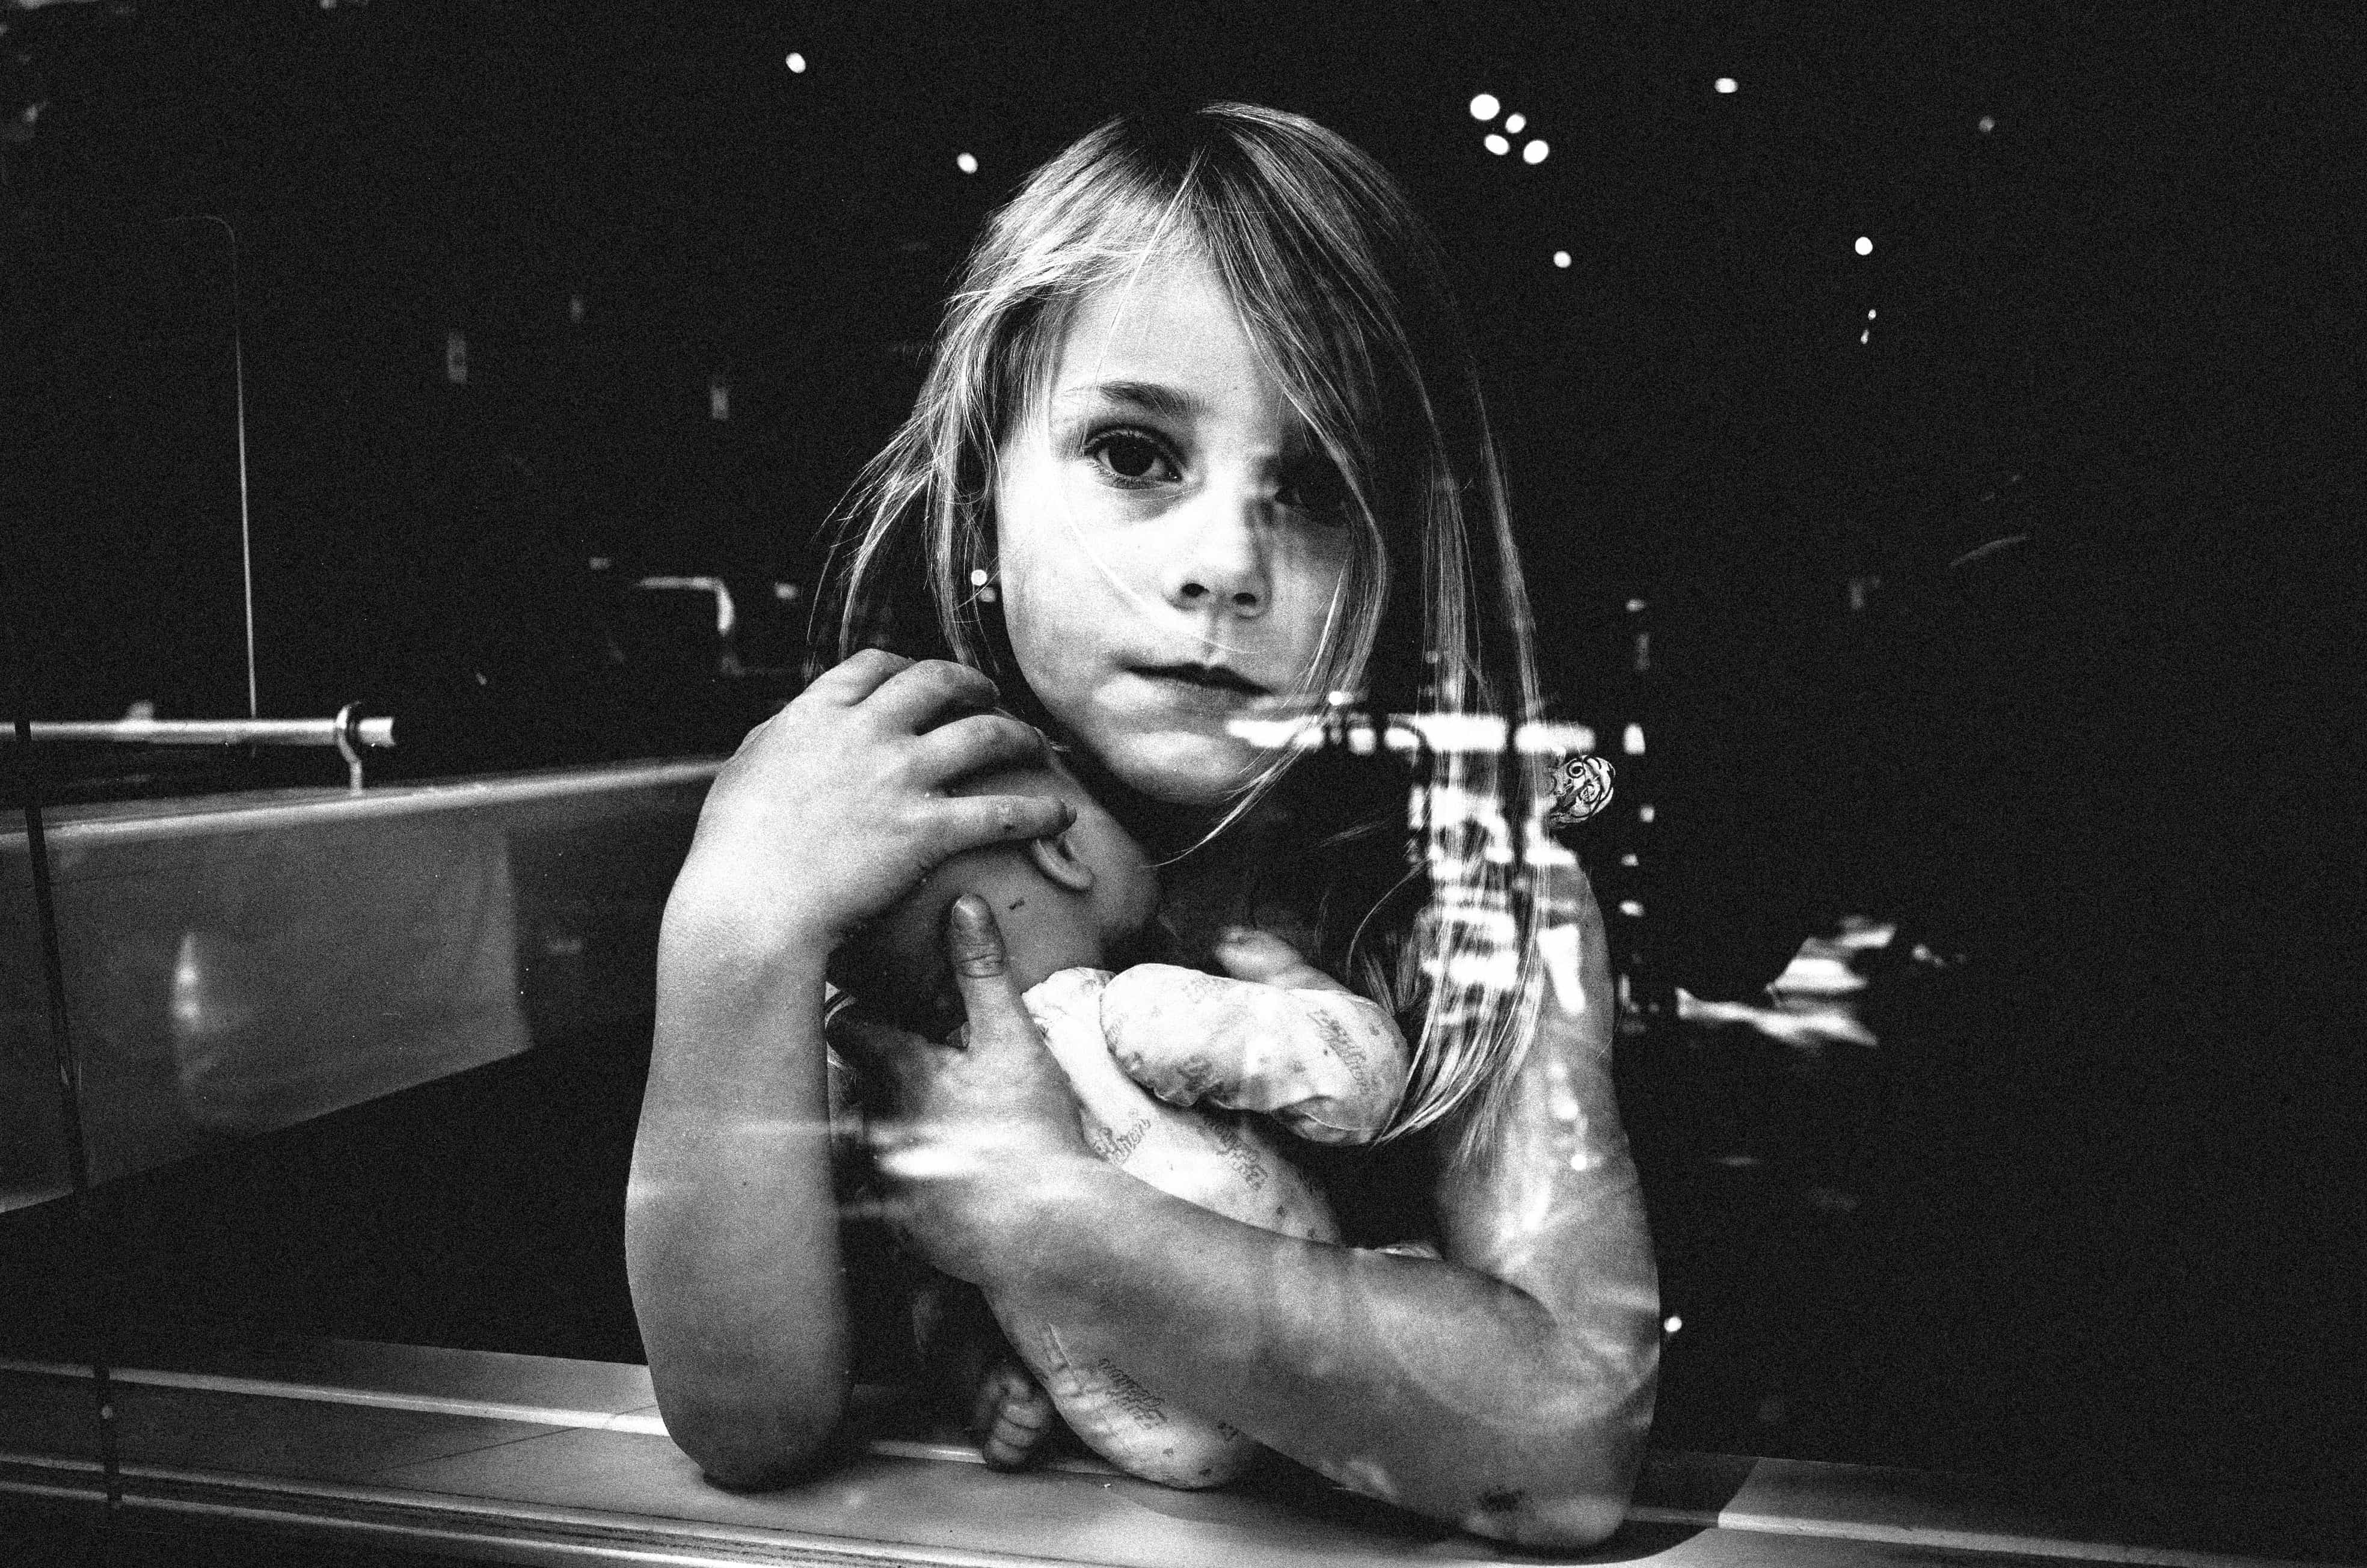 amsterdam-2015-ricohgr-doll-girl-eric kim street photograpy - black and white - Monochrome-14